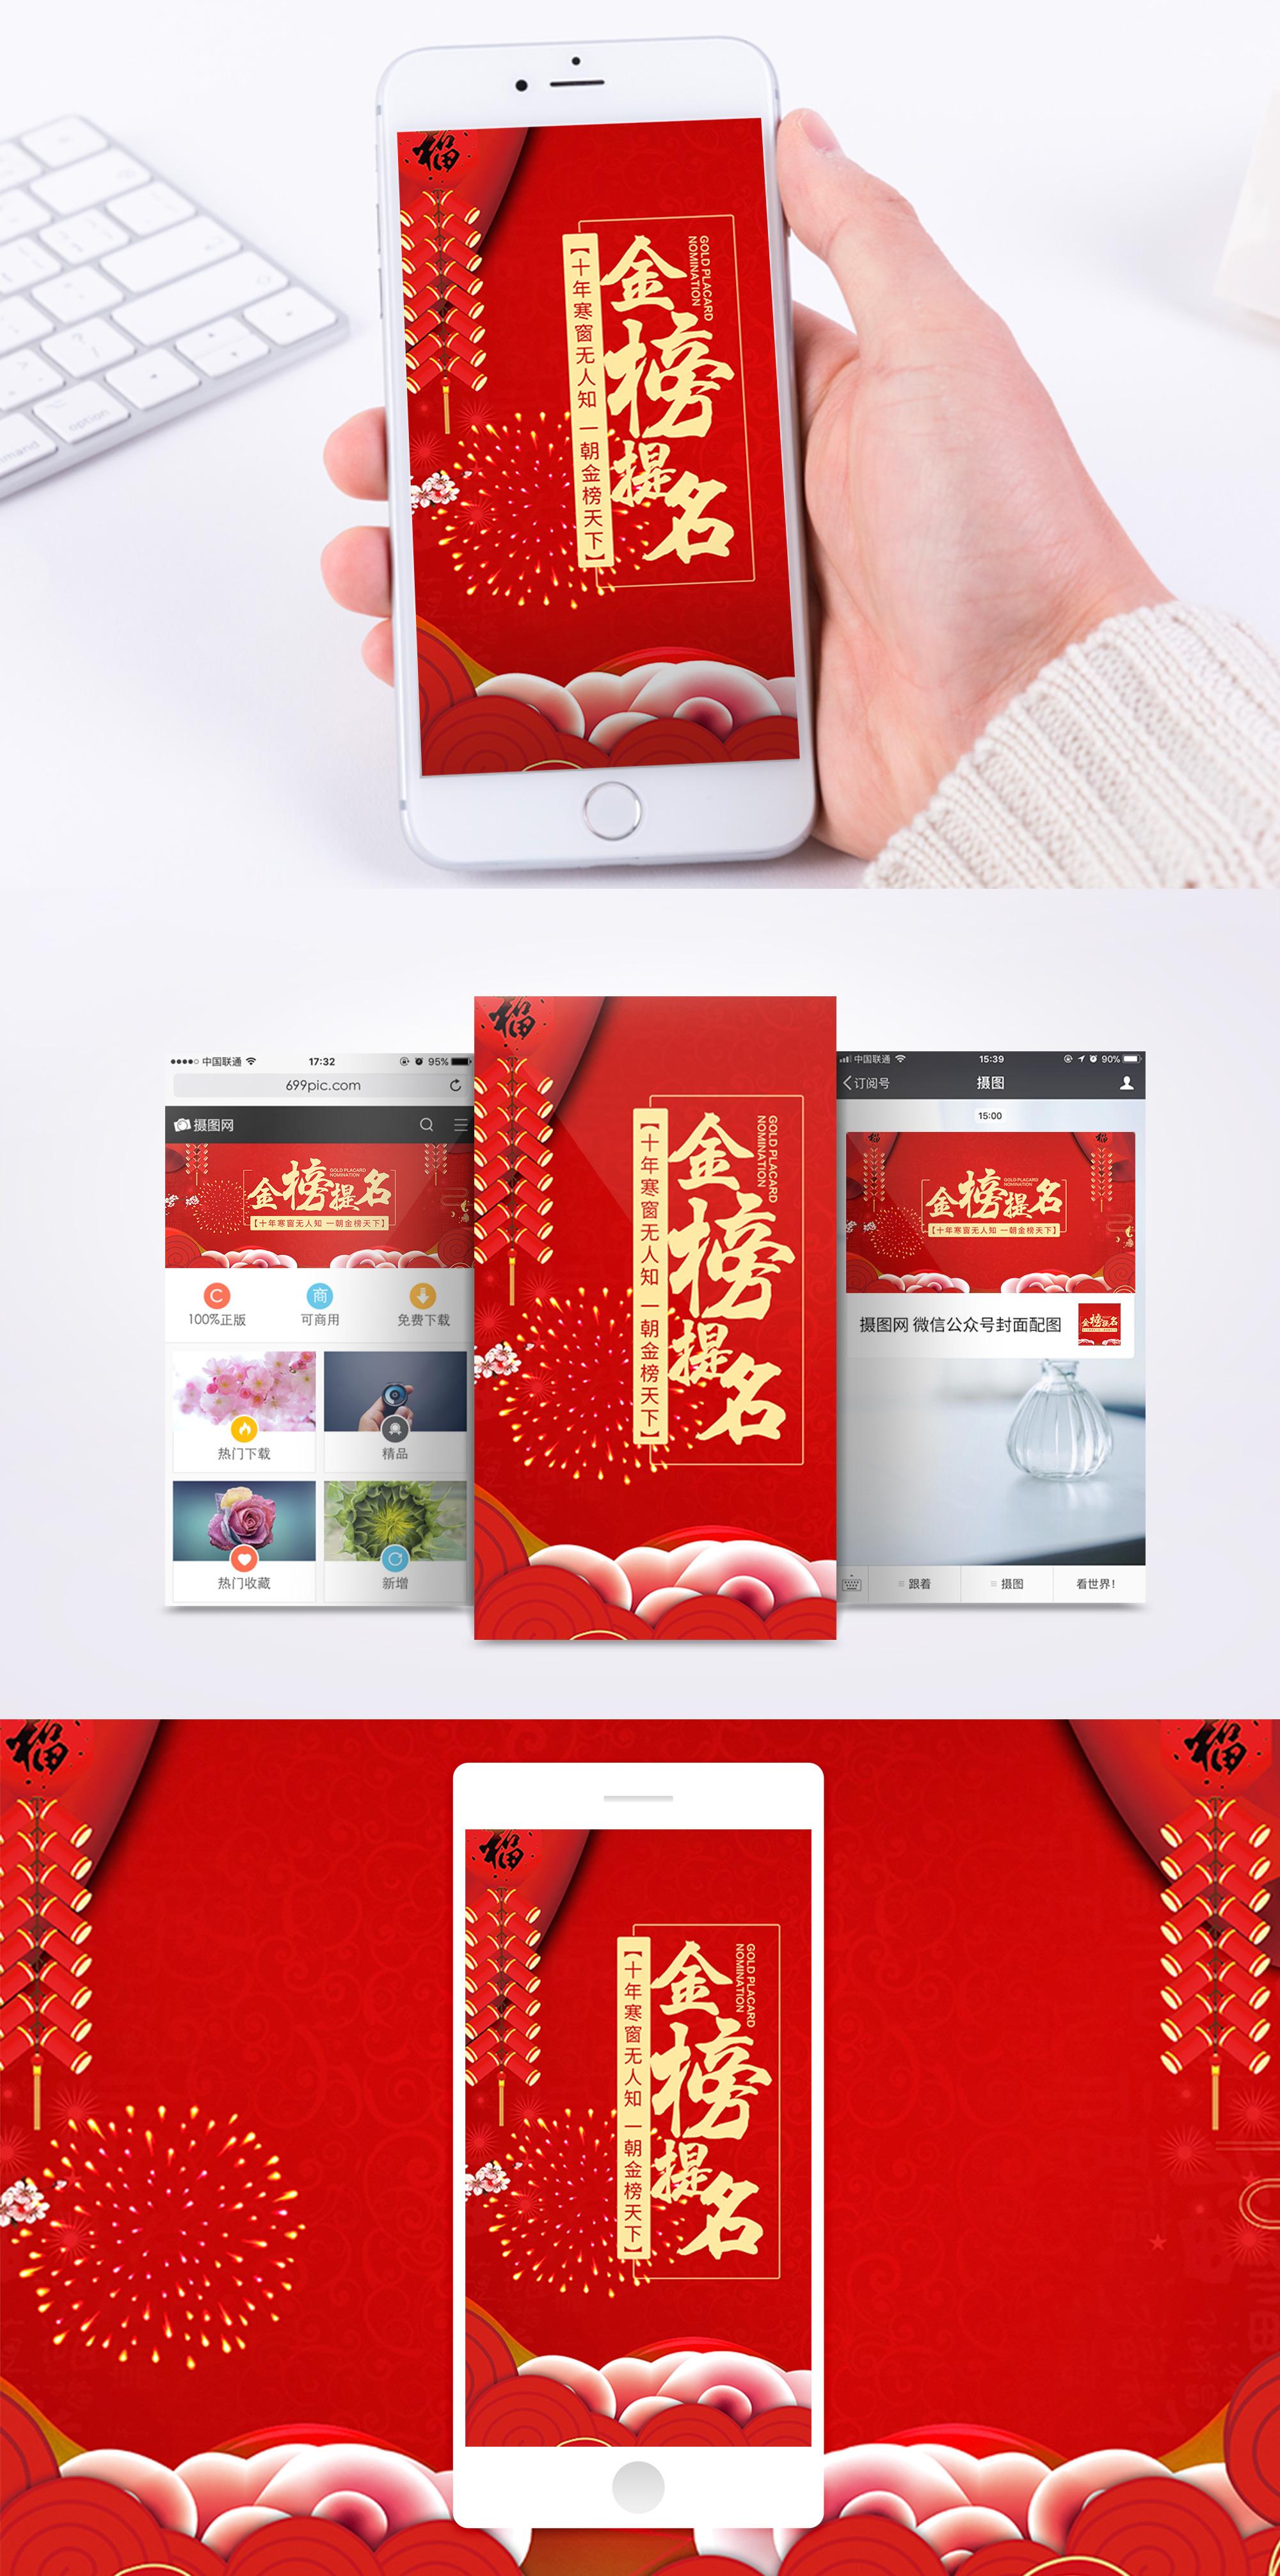 f473b824159d jinbang название мобильного телефона плакат с картой ...